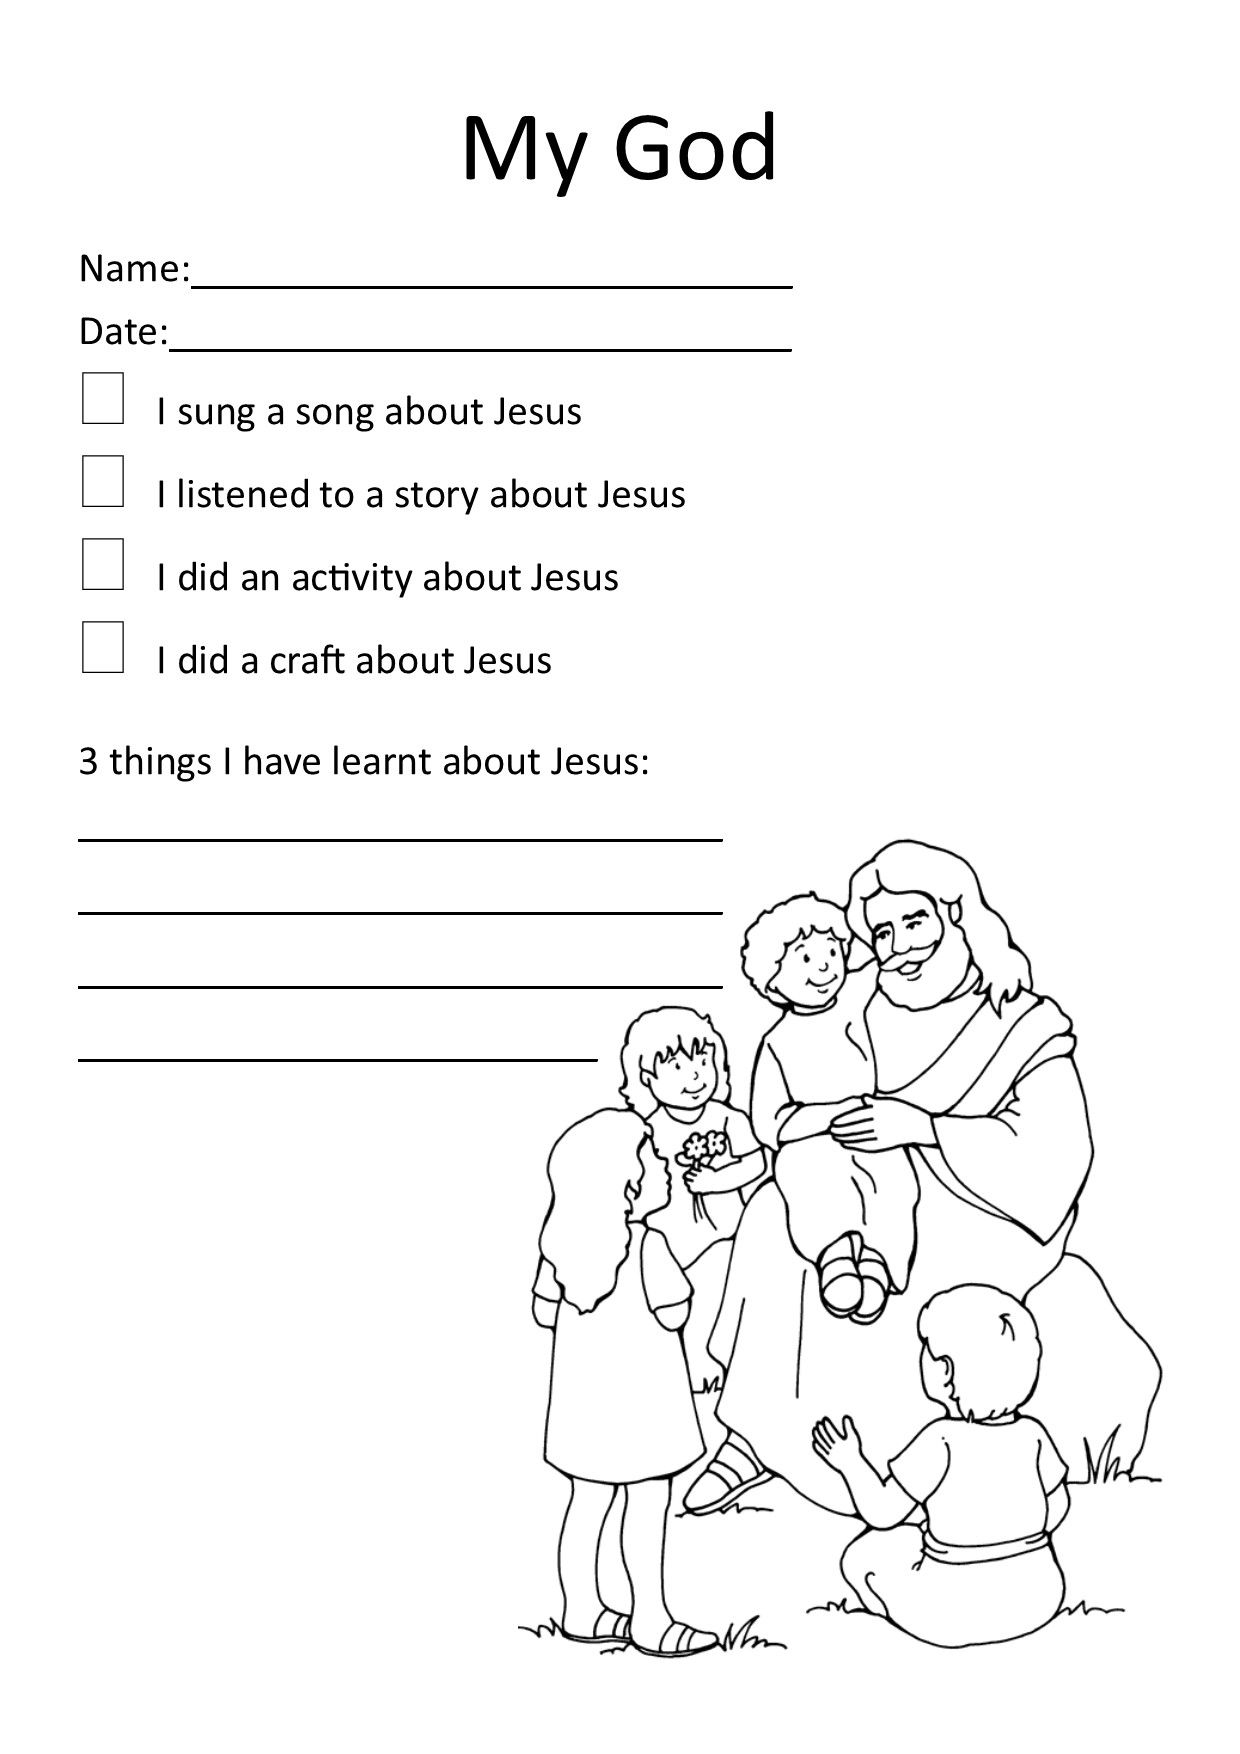 My God Worksheet